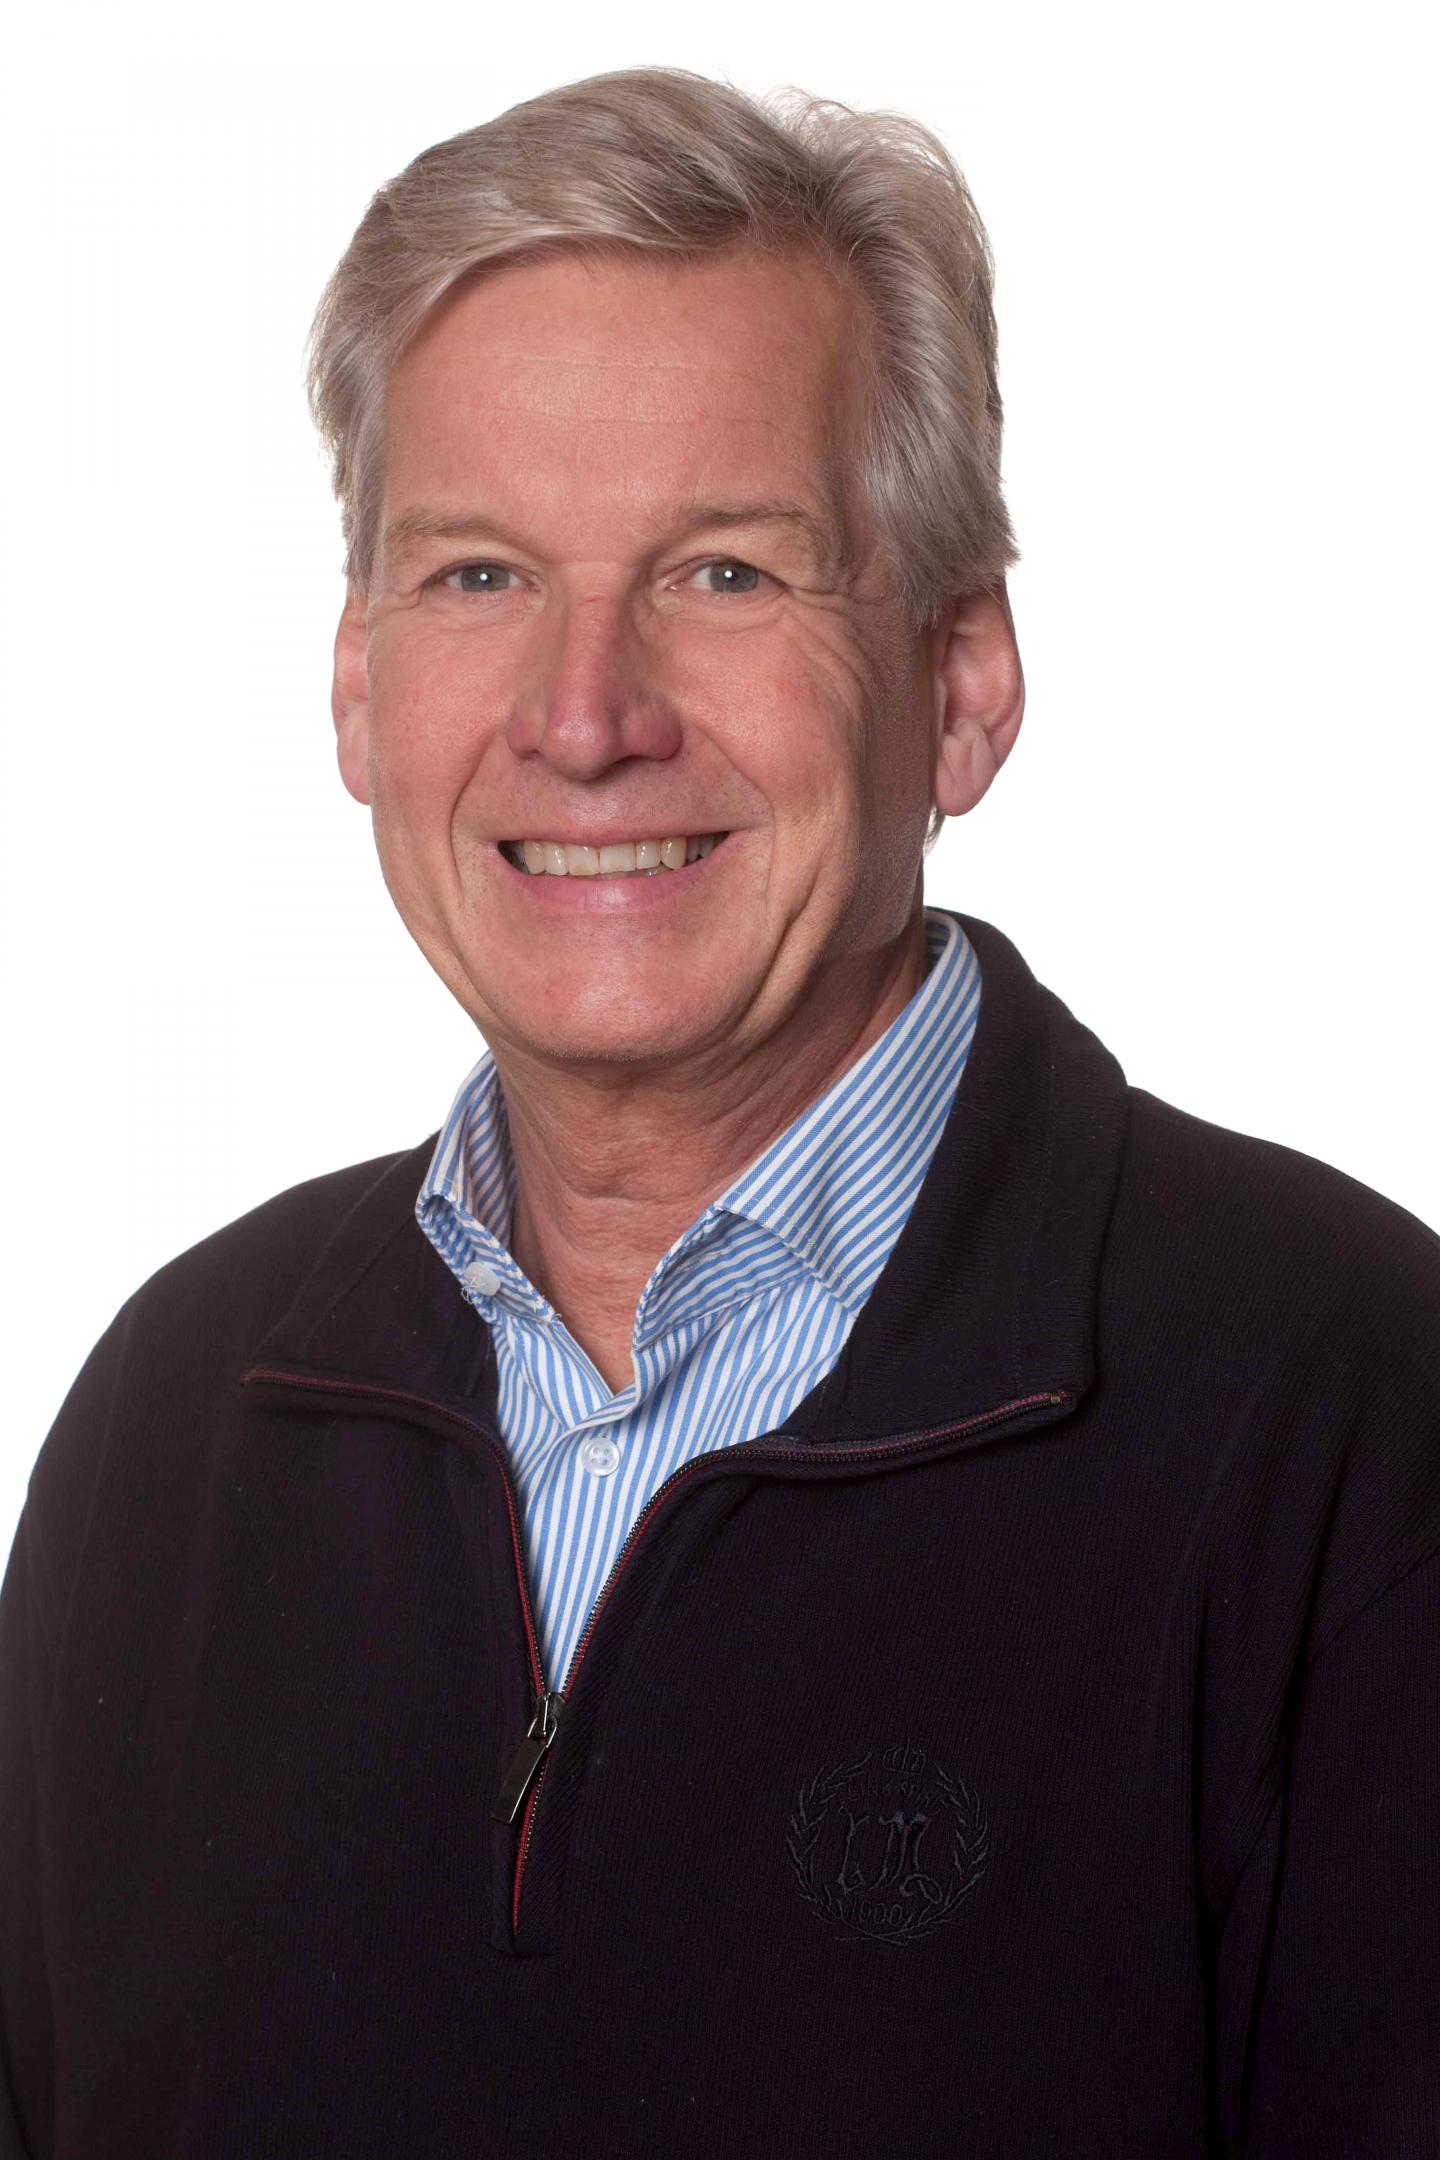 Lars Fandriks, University of Gothenburg